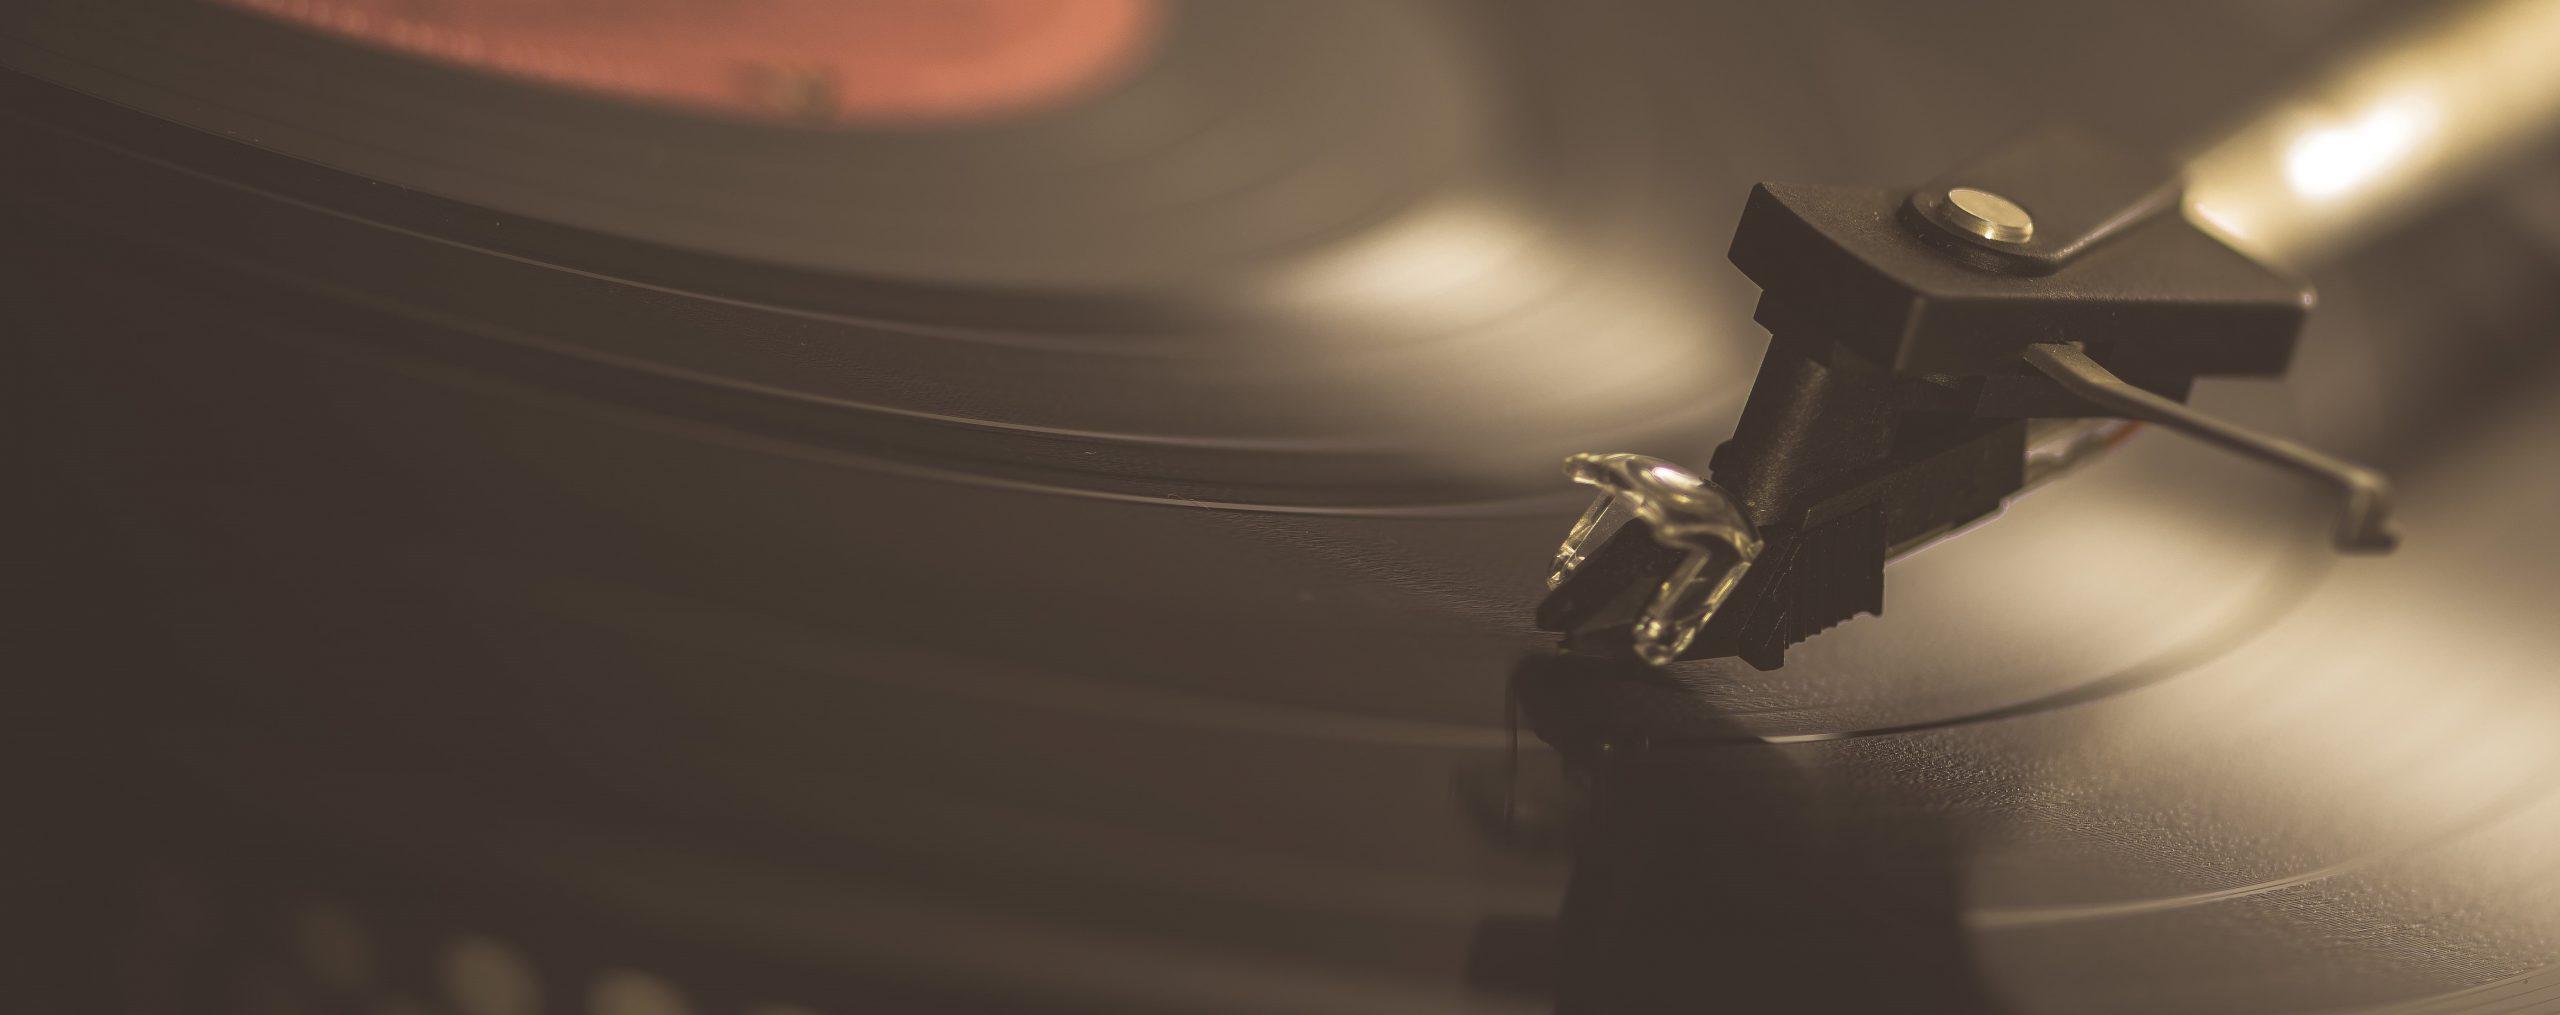 12 Inch Music - Cubsounds - House, Dance, Electro Klassiker